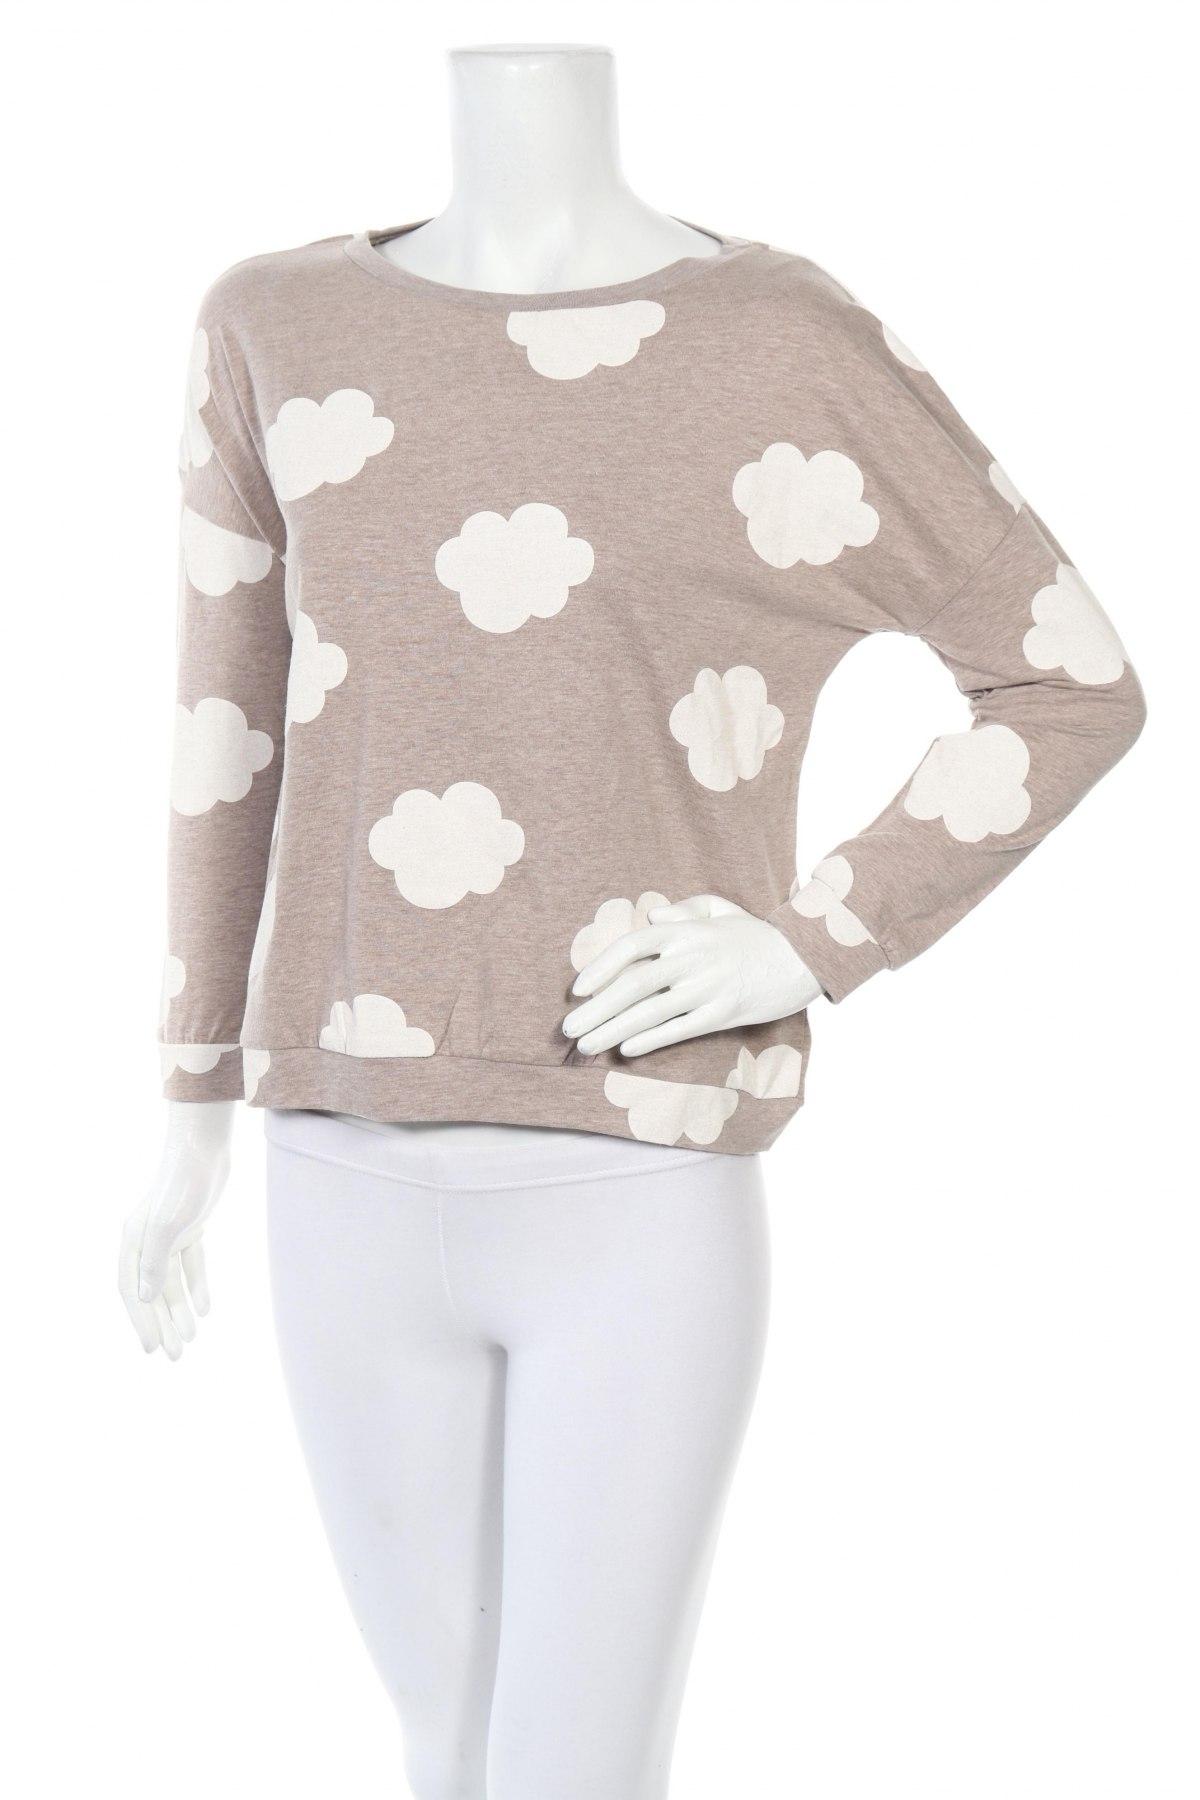 Пижама Anna Field, Размер S, Цвят Бежов, 50% памук, 45% полиестер, 5% еластан, Цена 28,50лв.